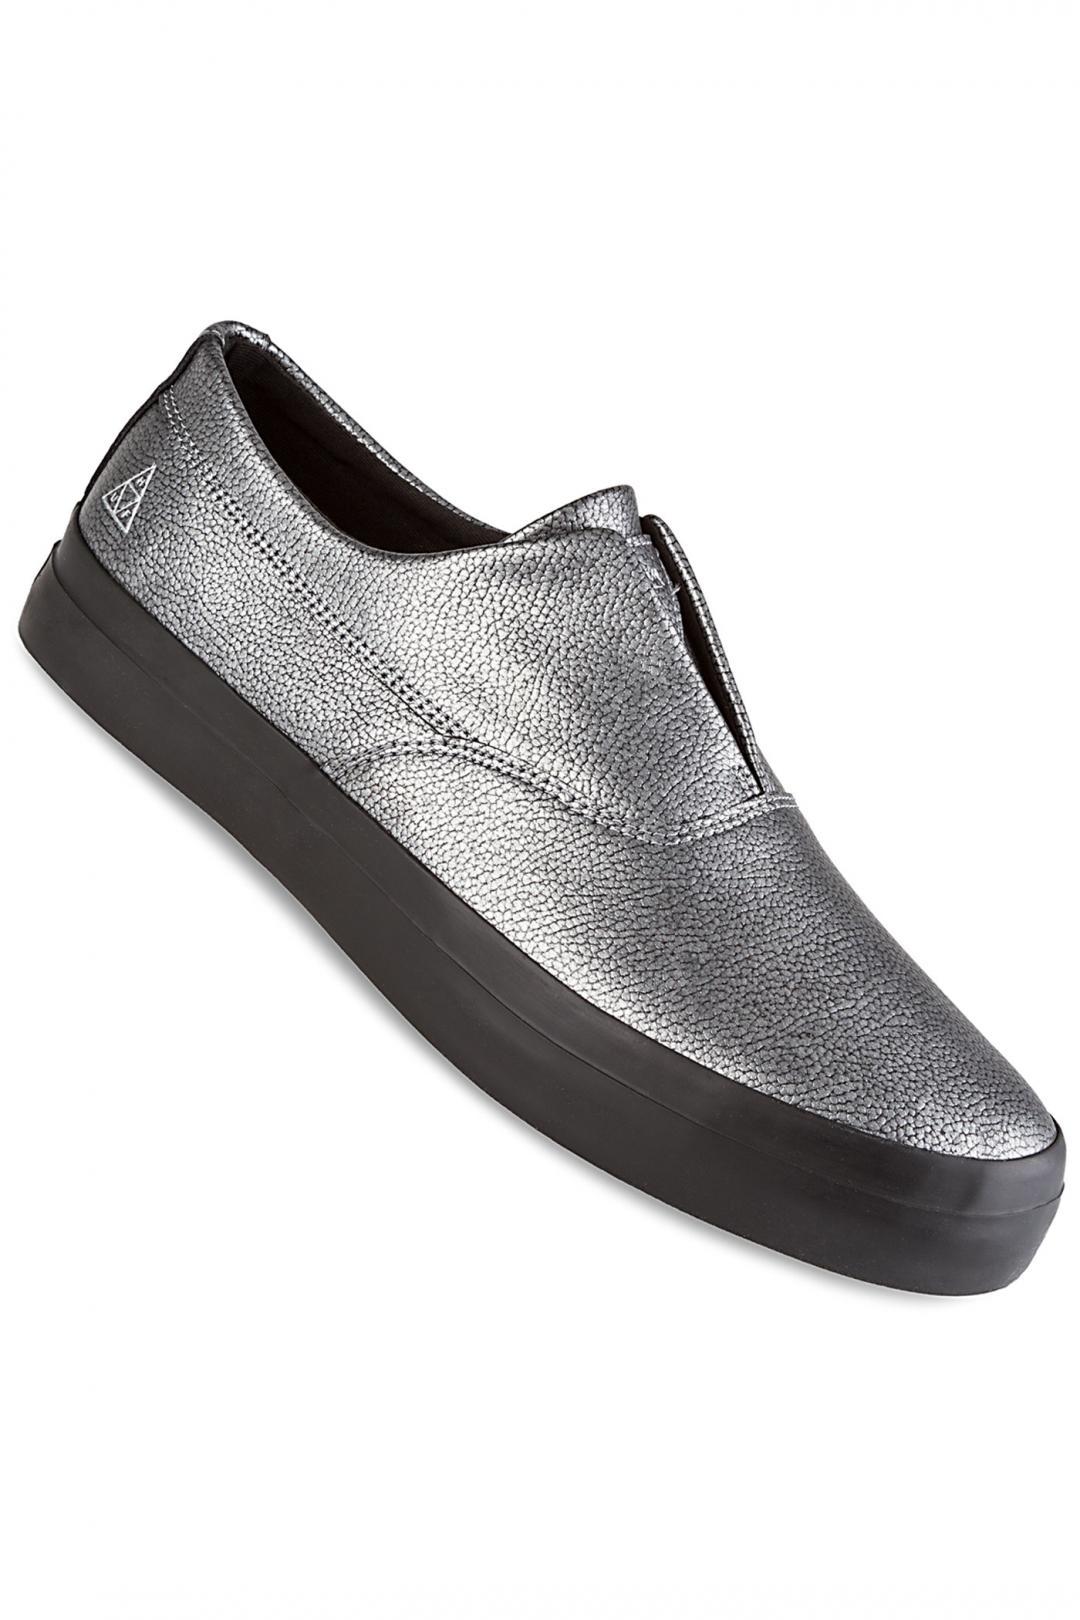 Uomo HUF Dylan Slip On silver metal | Sneakers slip on